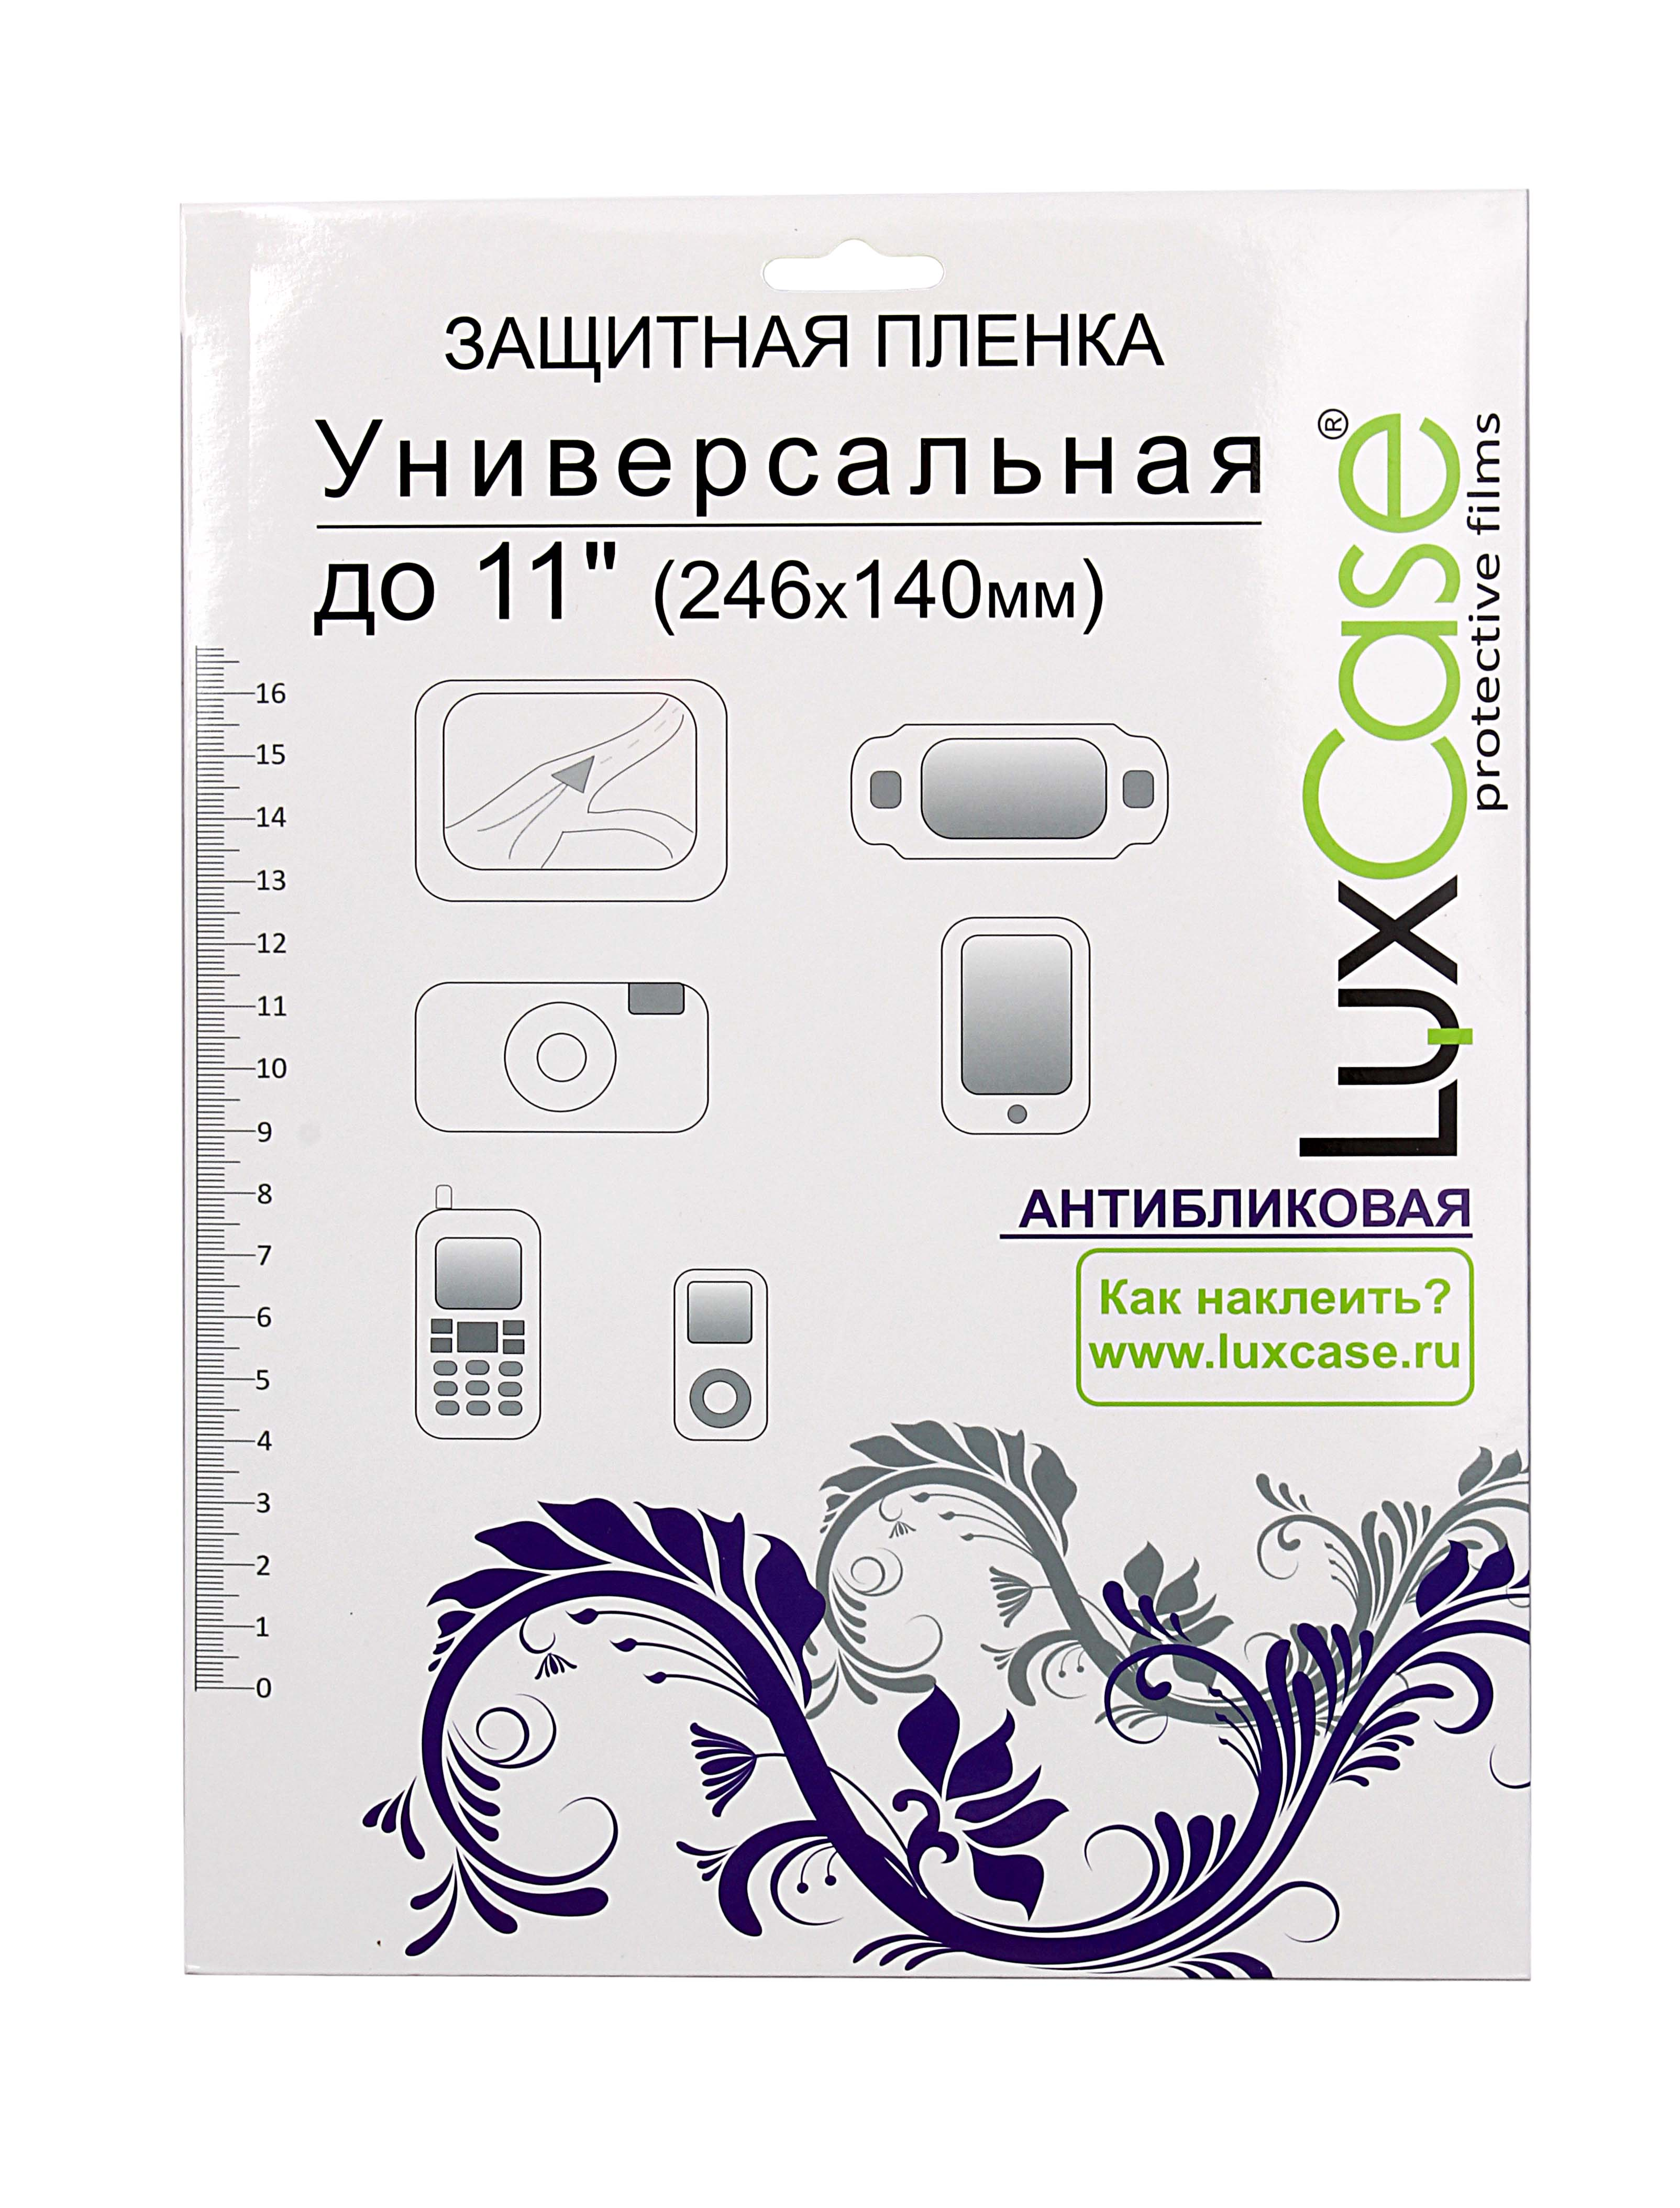 Защитная пленка Luxcase Real Brand Technics 332.000